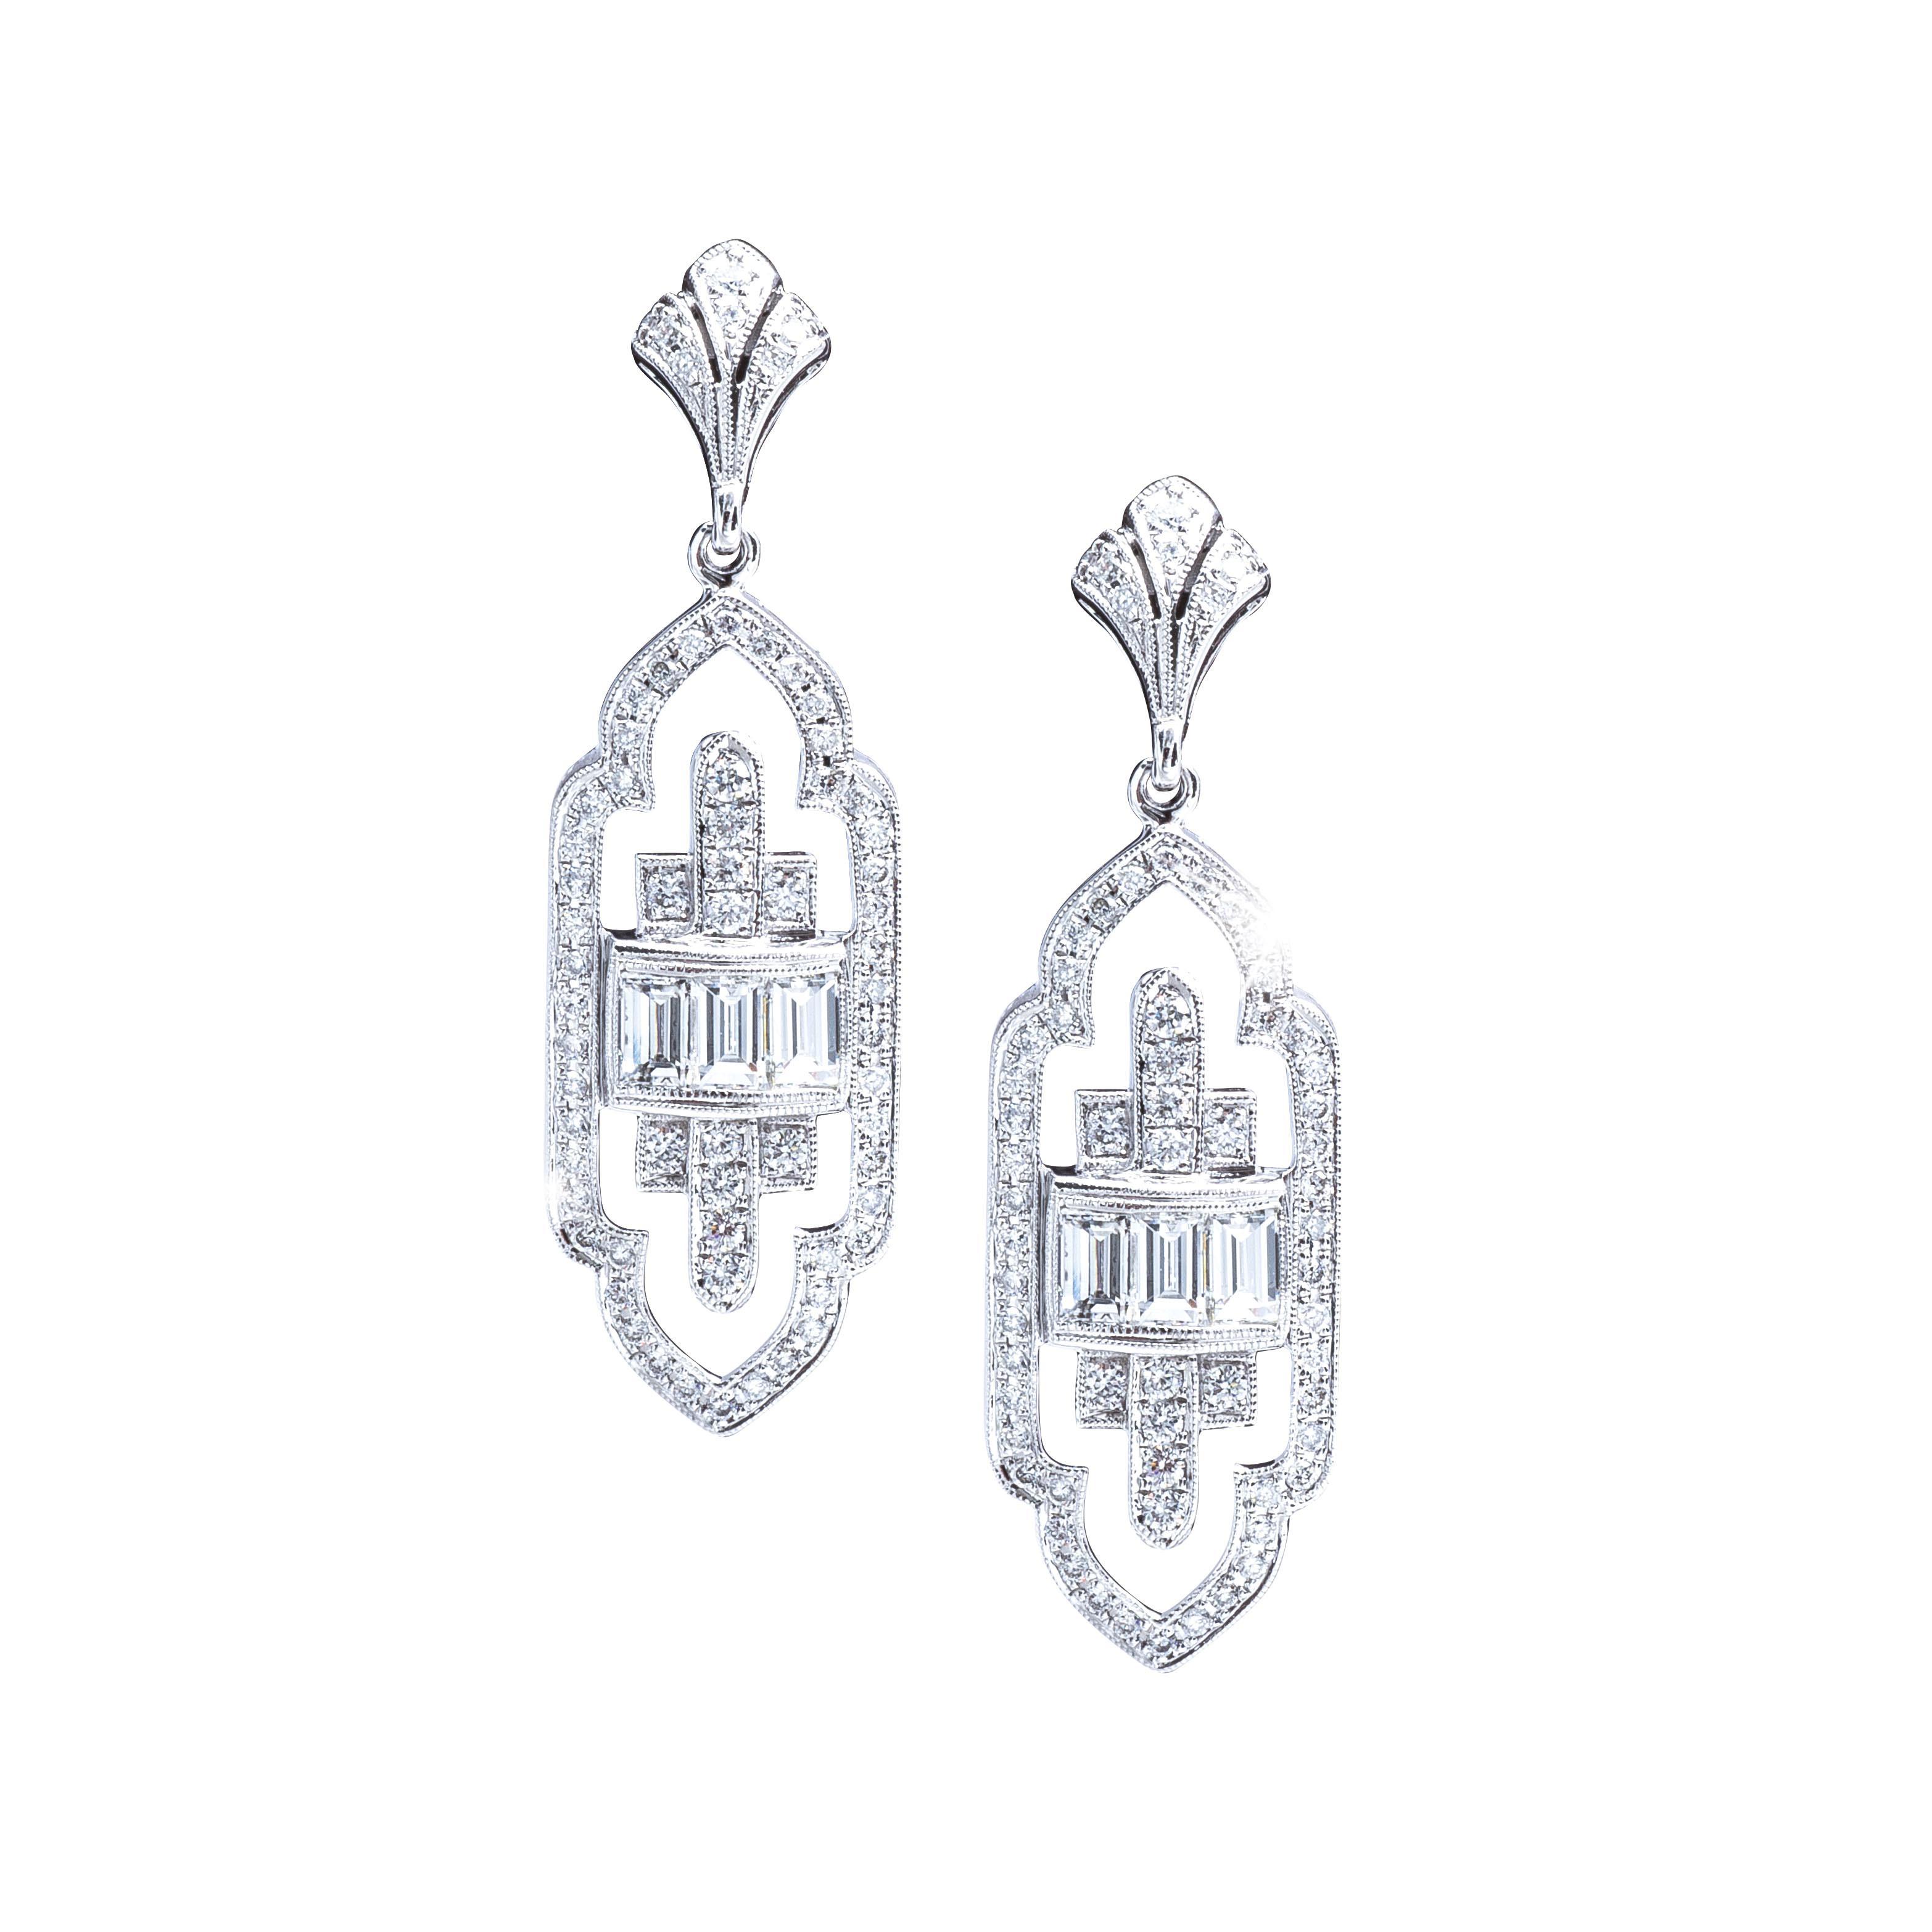 New Art Deco-Inspired Beverley K 1.05 CTW Diamond Drop Earrings